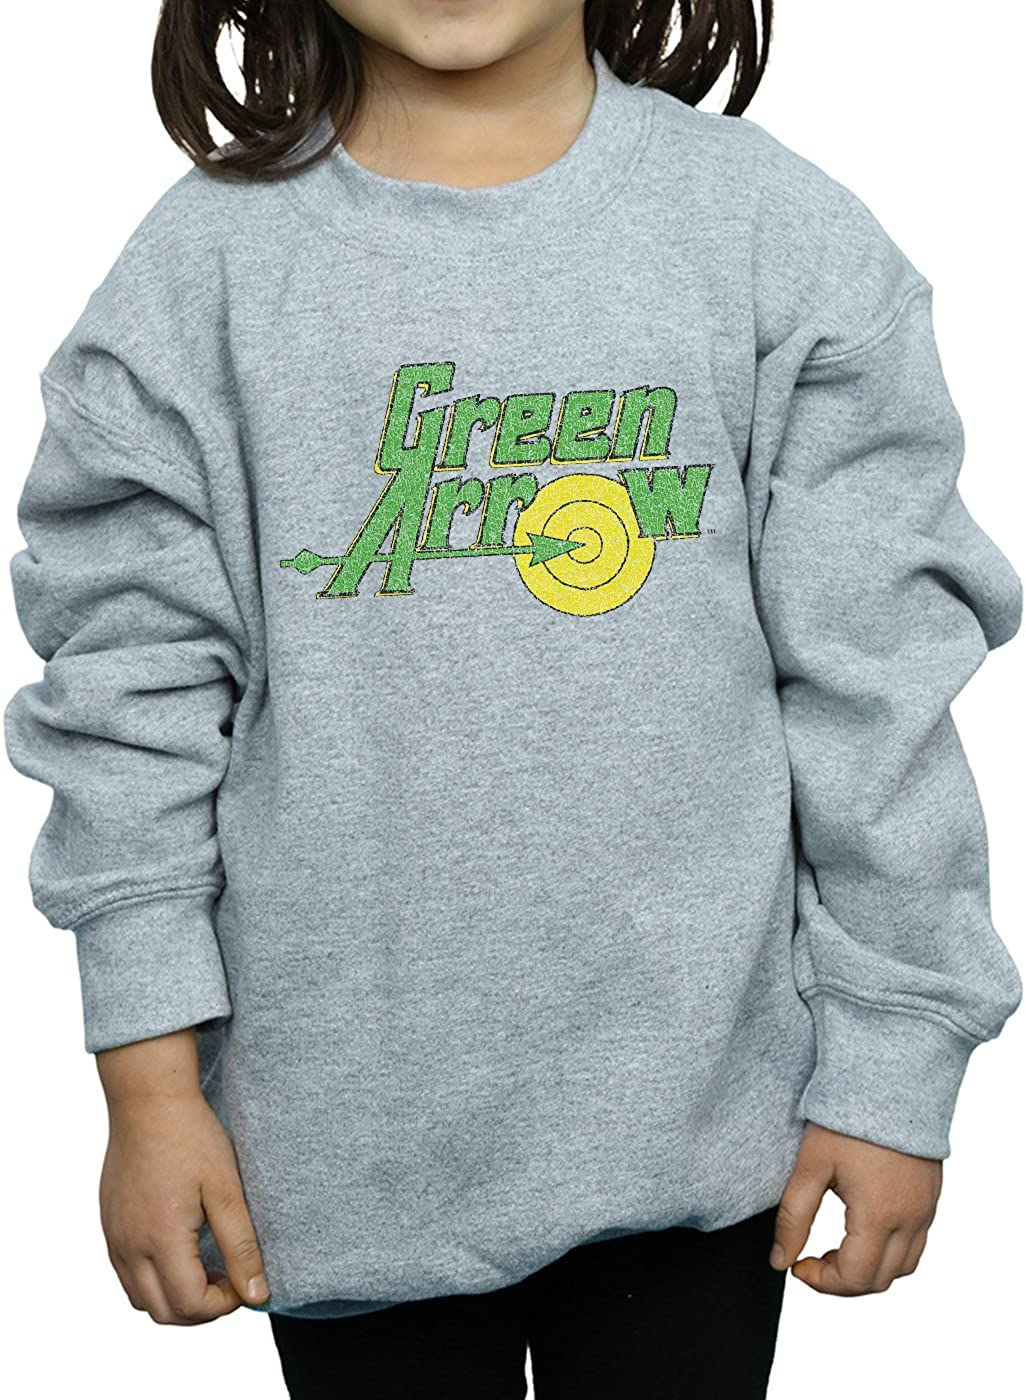 DC Comics Girls Green Arrow Crackle Logo Sweatshirt